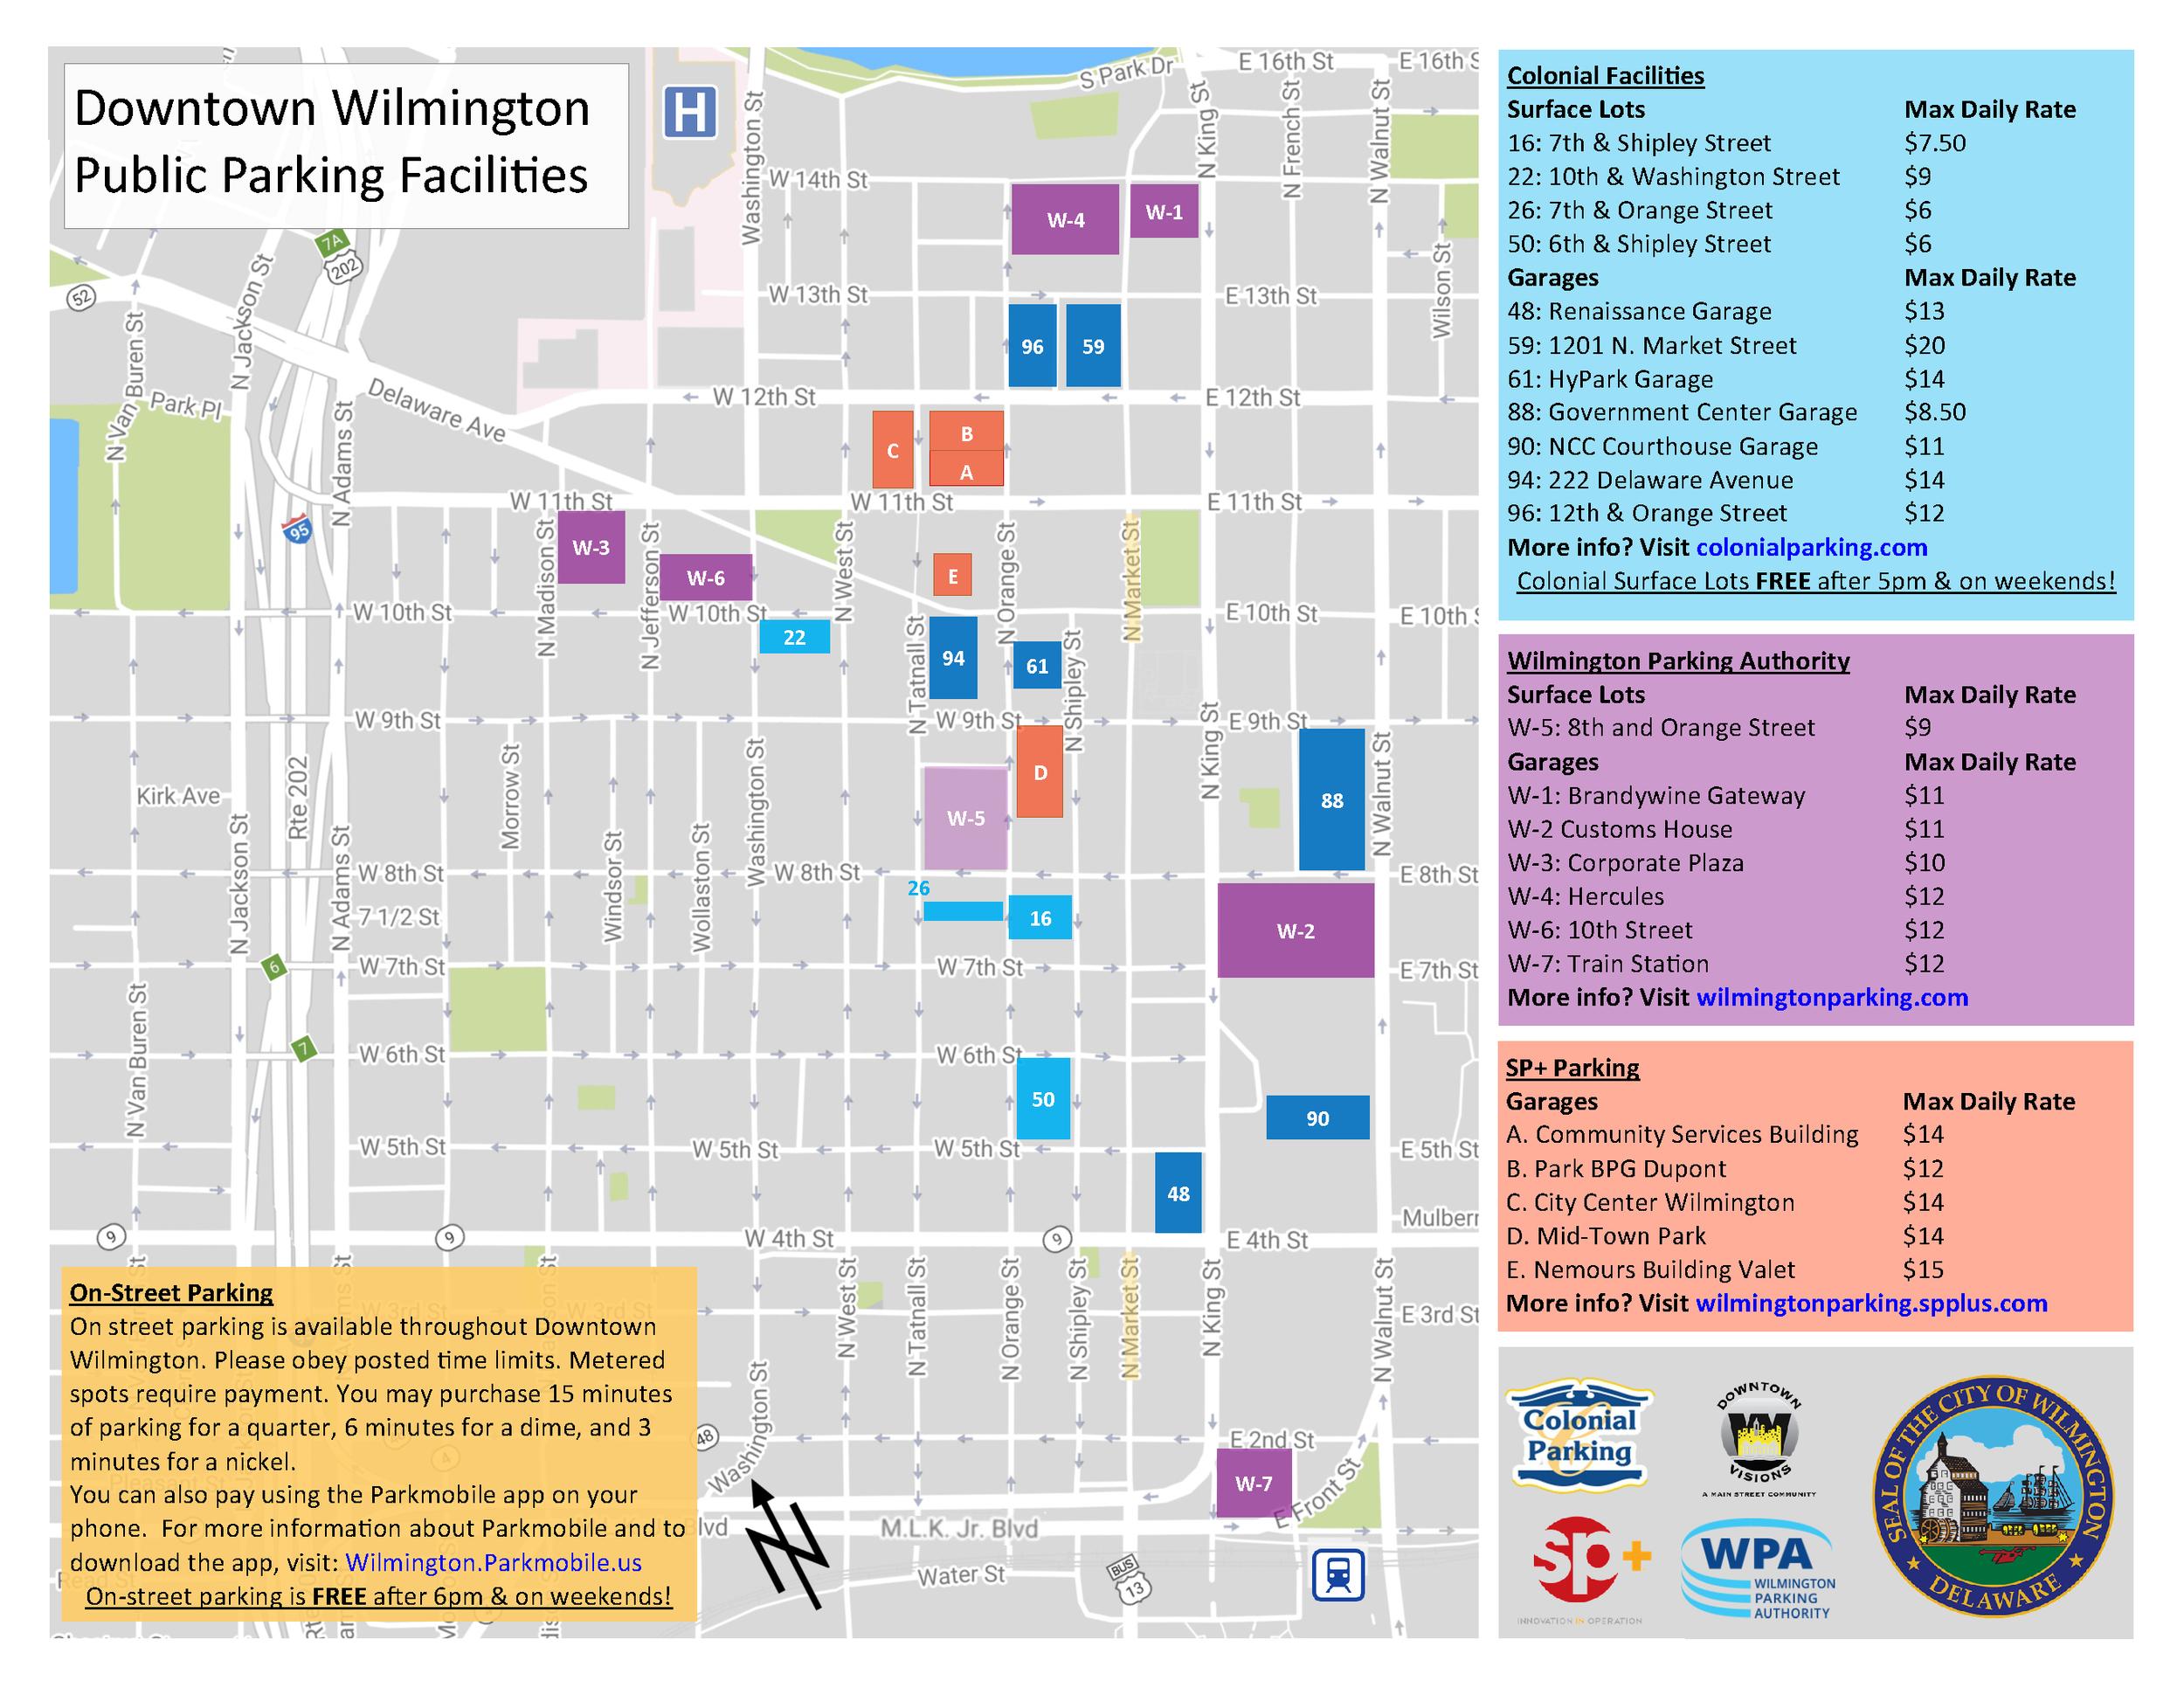 Downtown Parking v3 (1).png